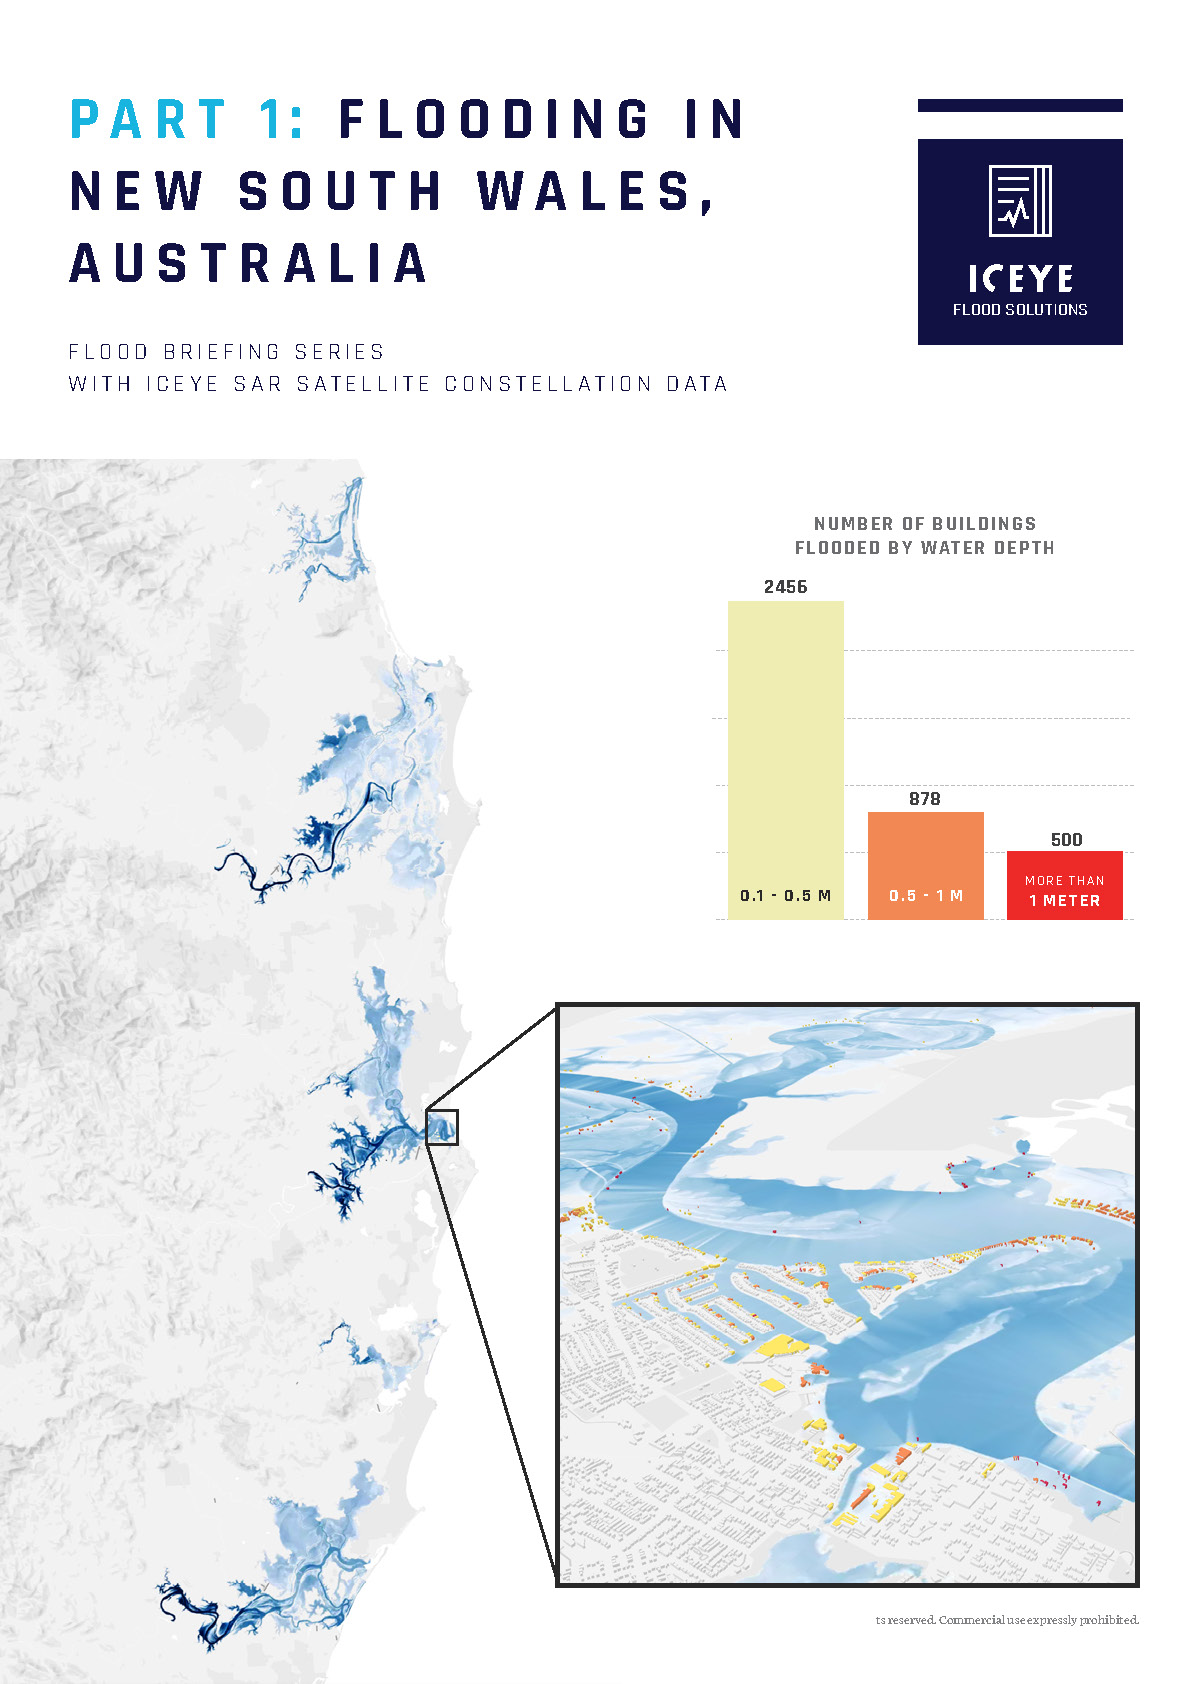 ICEYE_Flood_Briefing_Australia_03202-Part2-2-cover